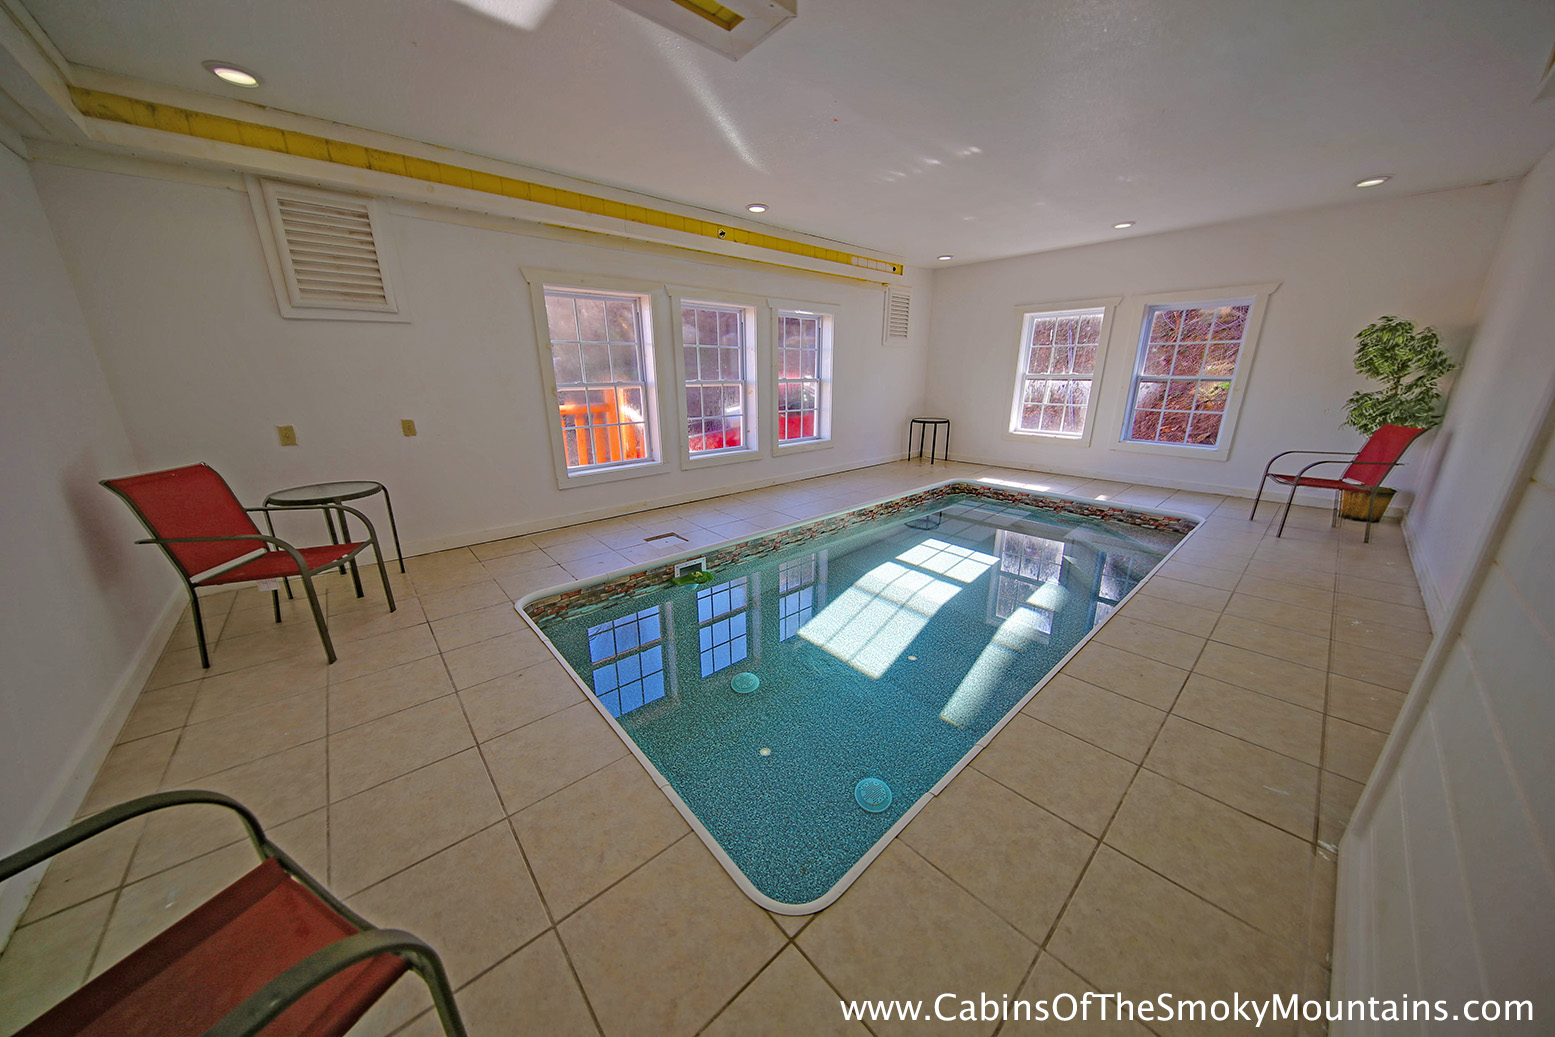 6 bedroom cabins in gatlinburg pigeon forge tn